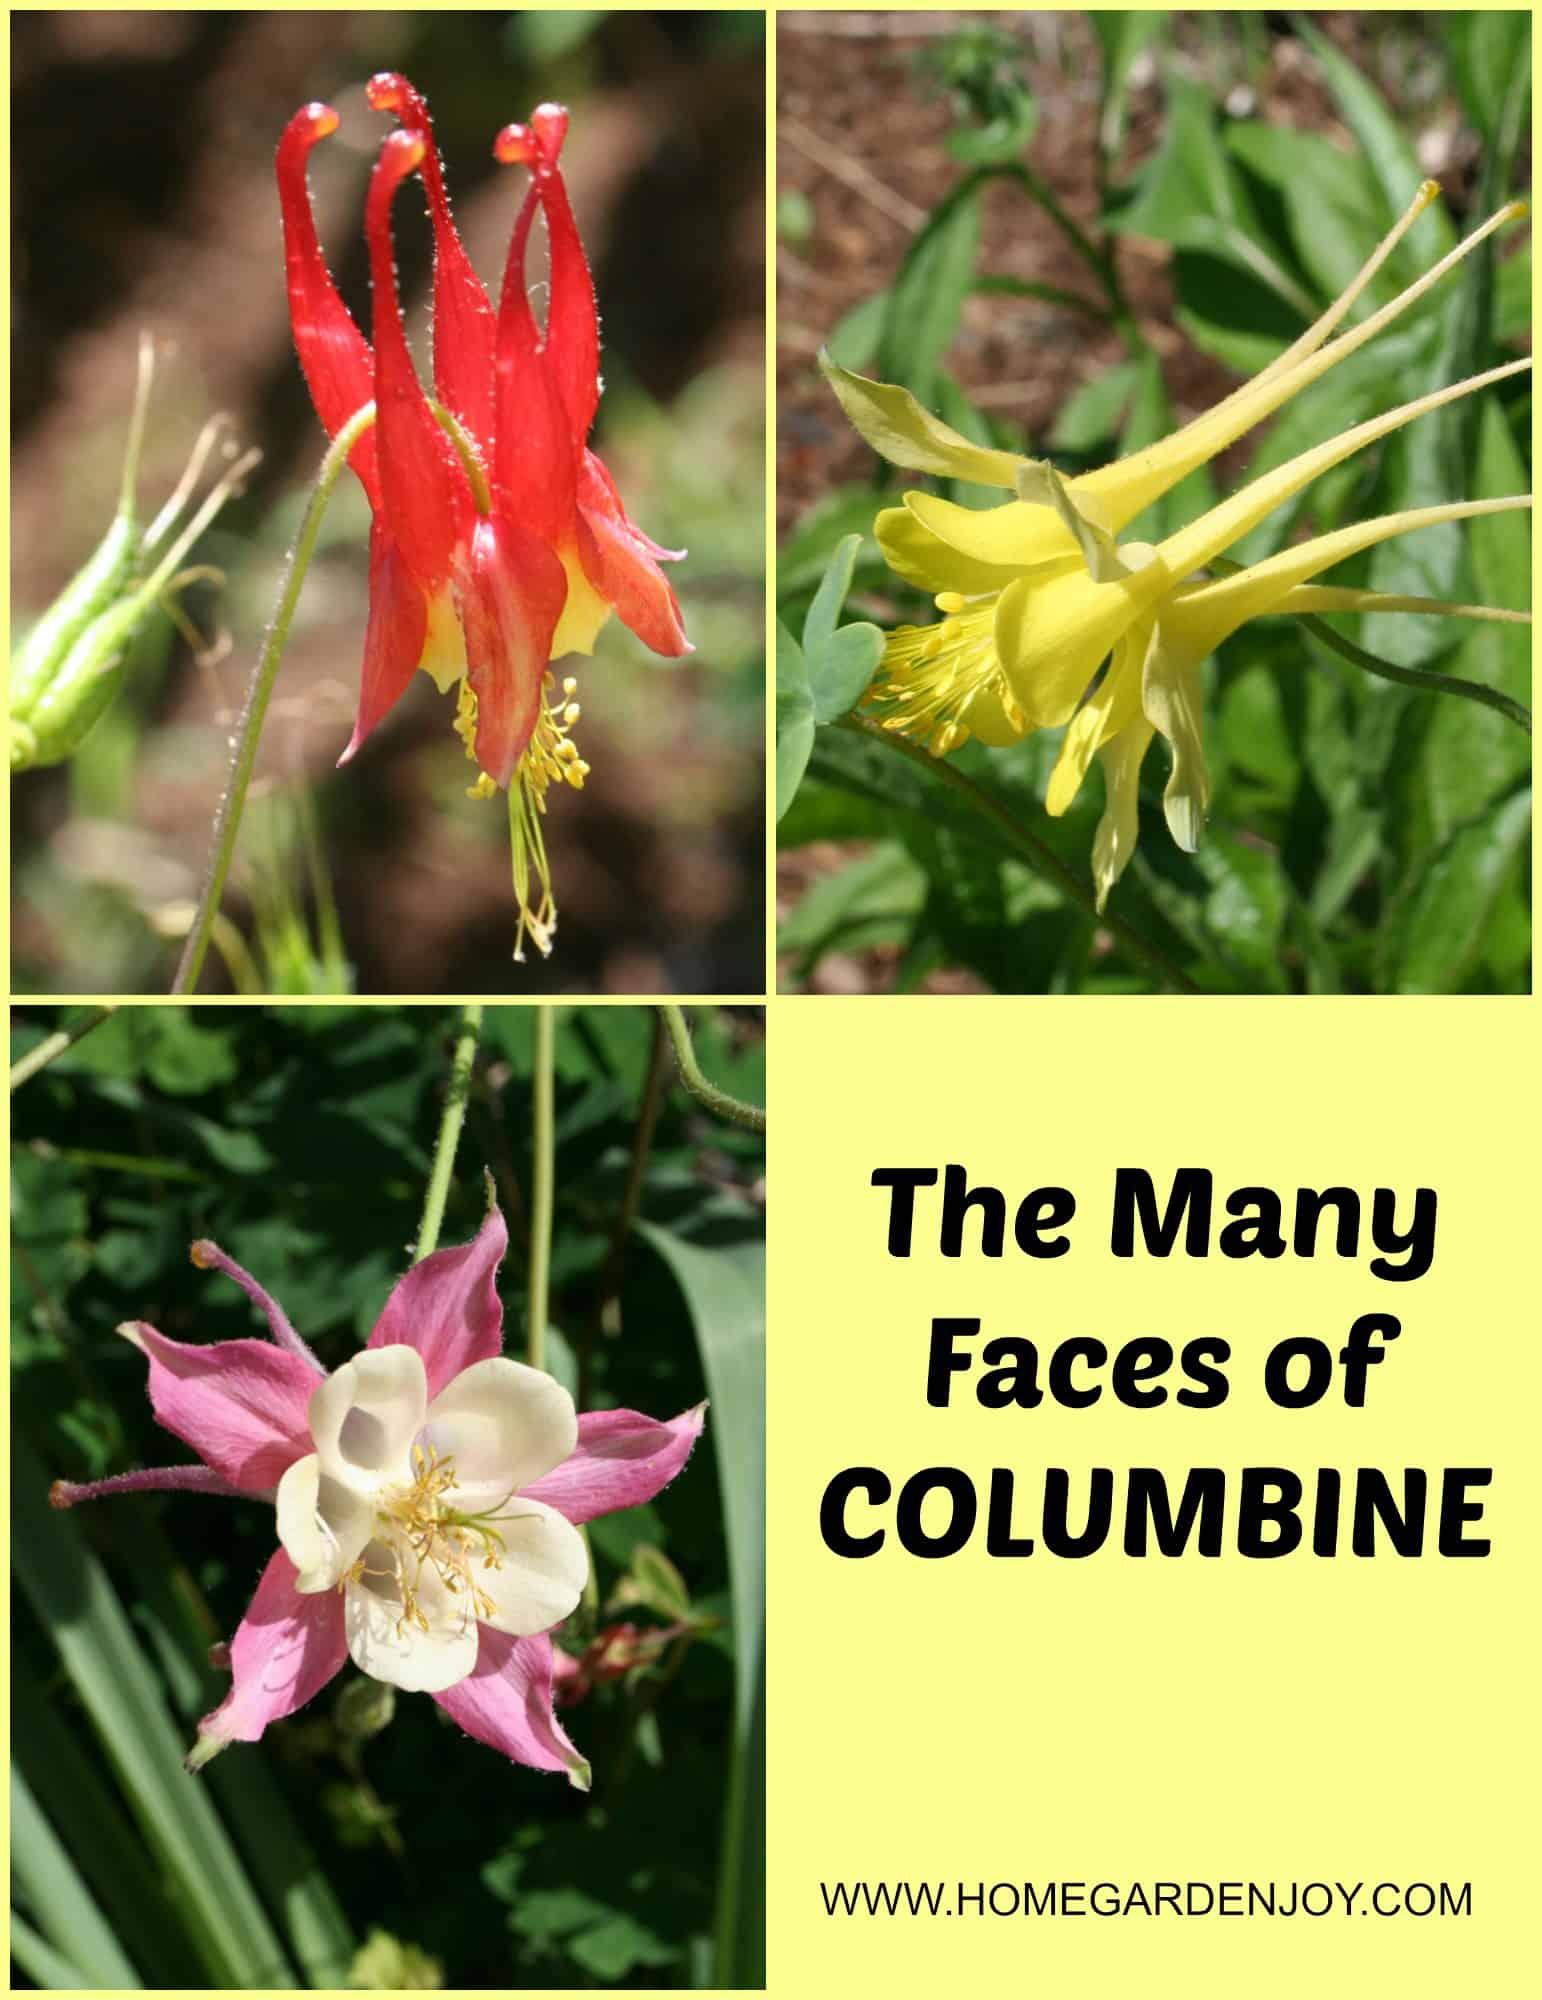 columbine flower  home garden joy, Beautiful flower